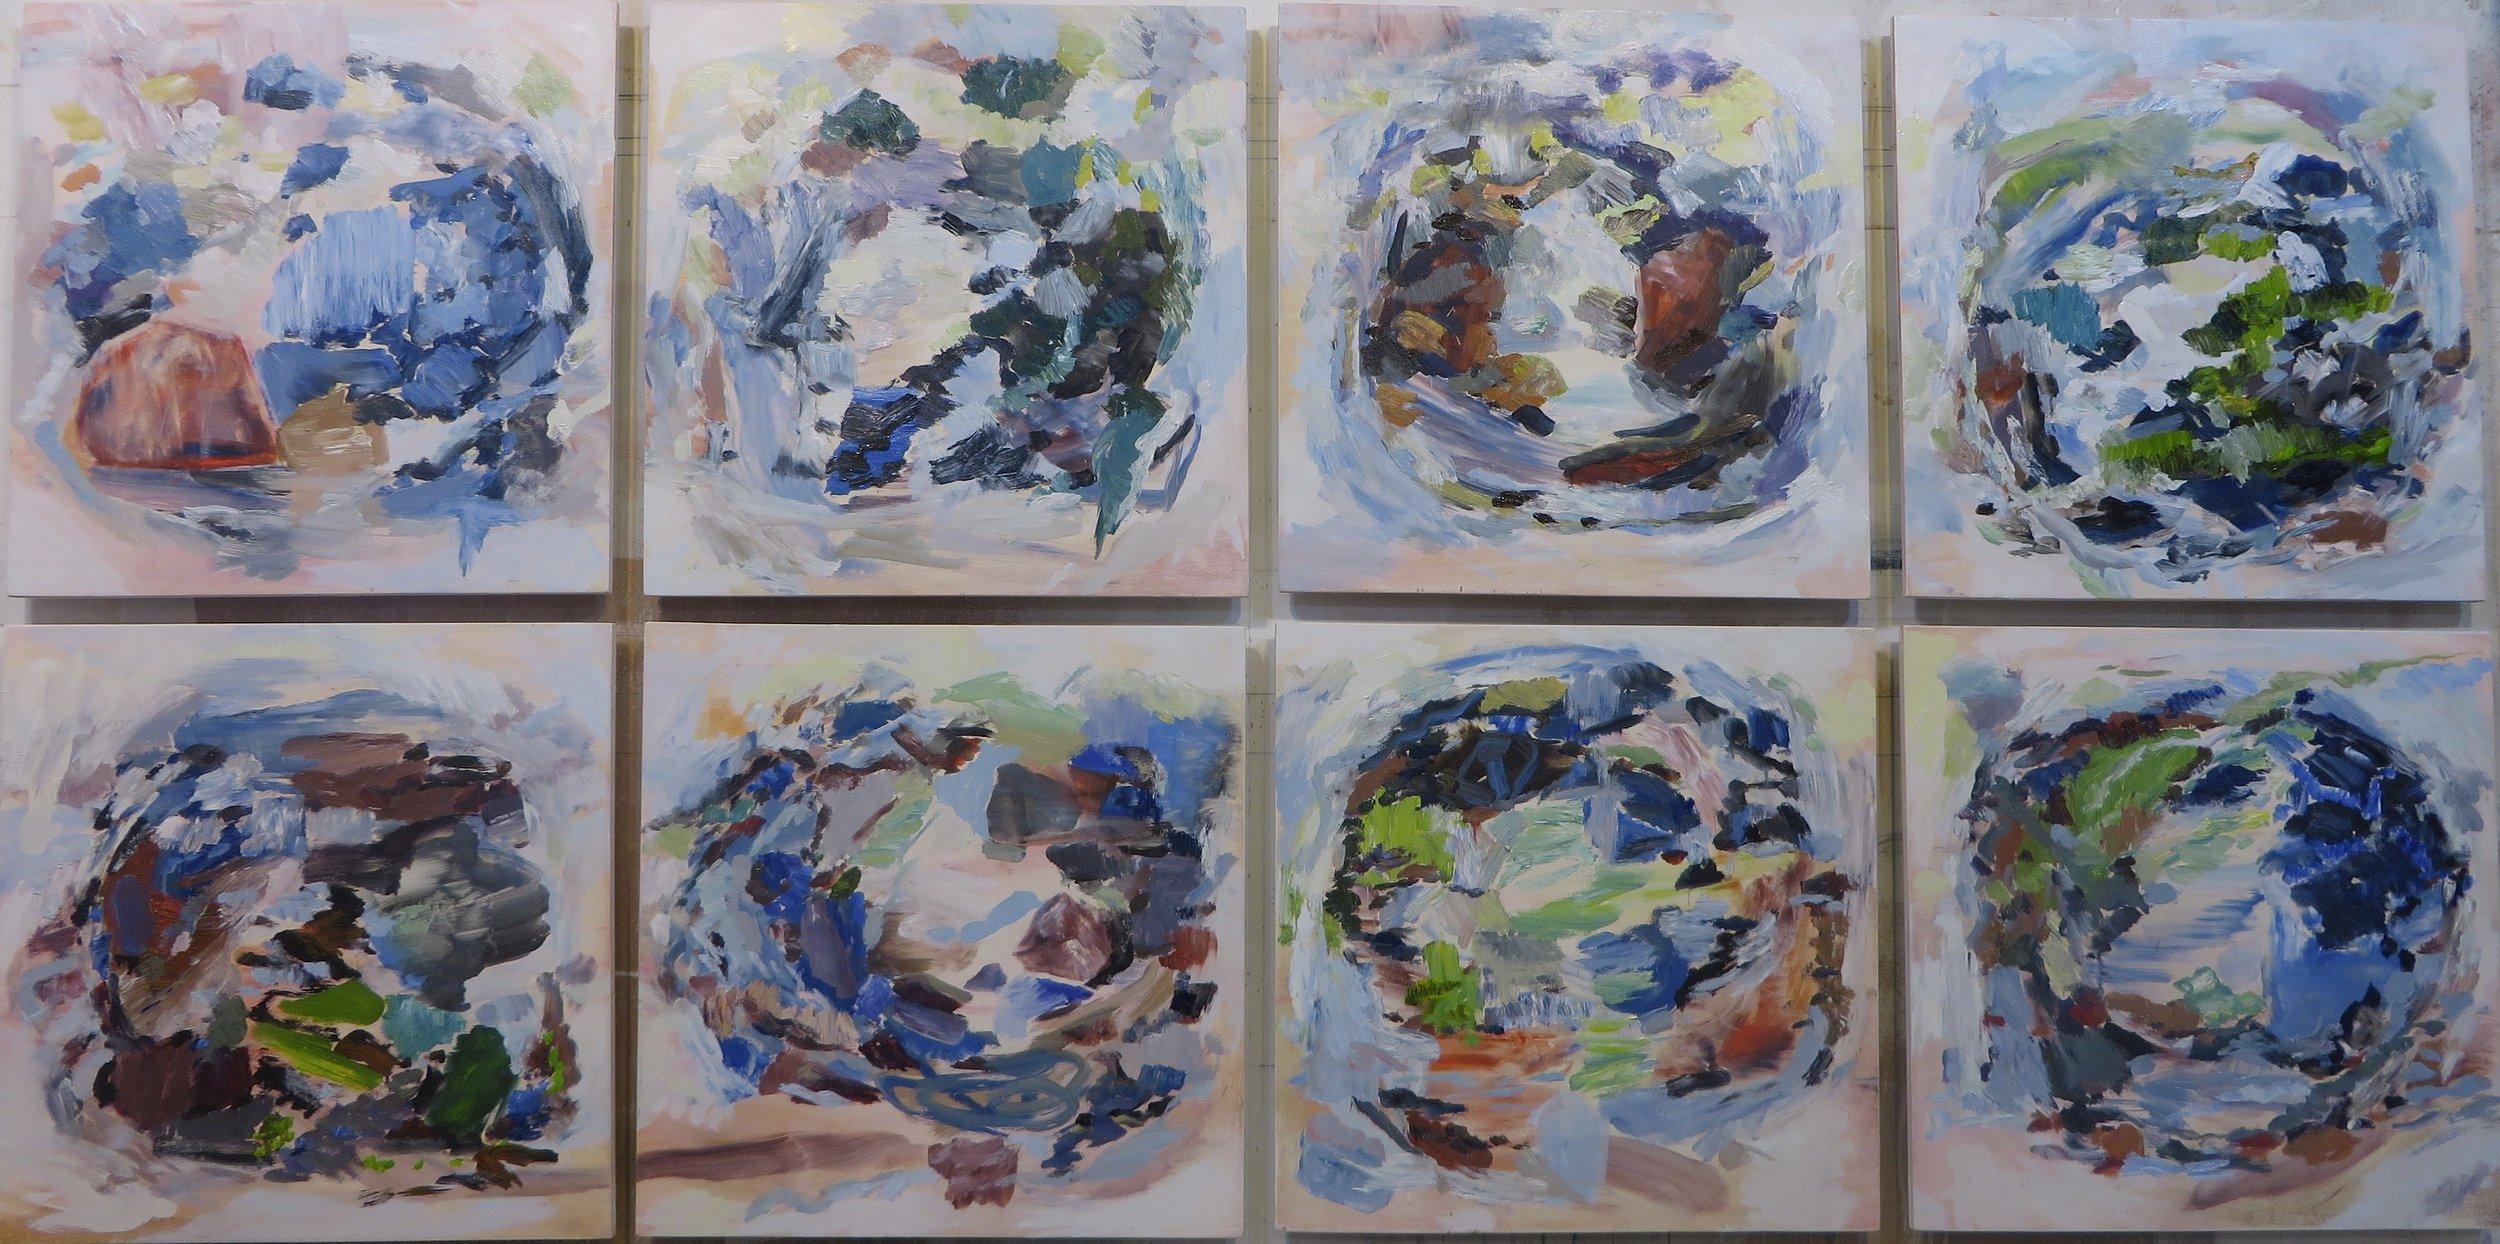 Earth Series 1 - 8, 2014